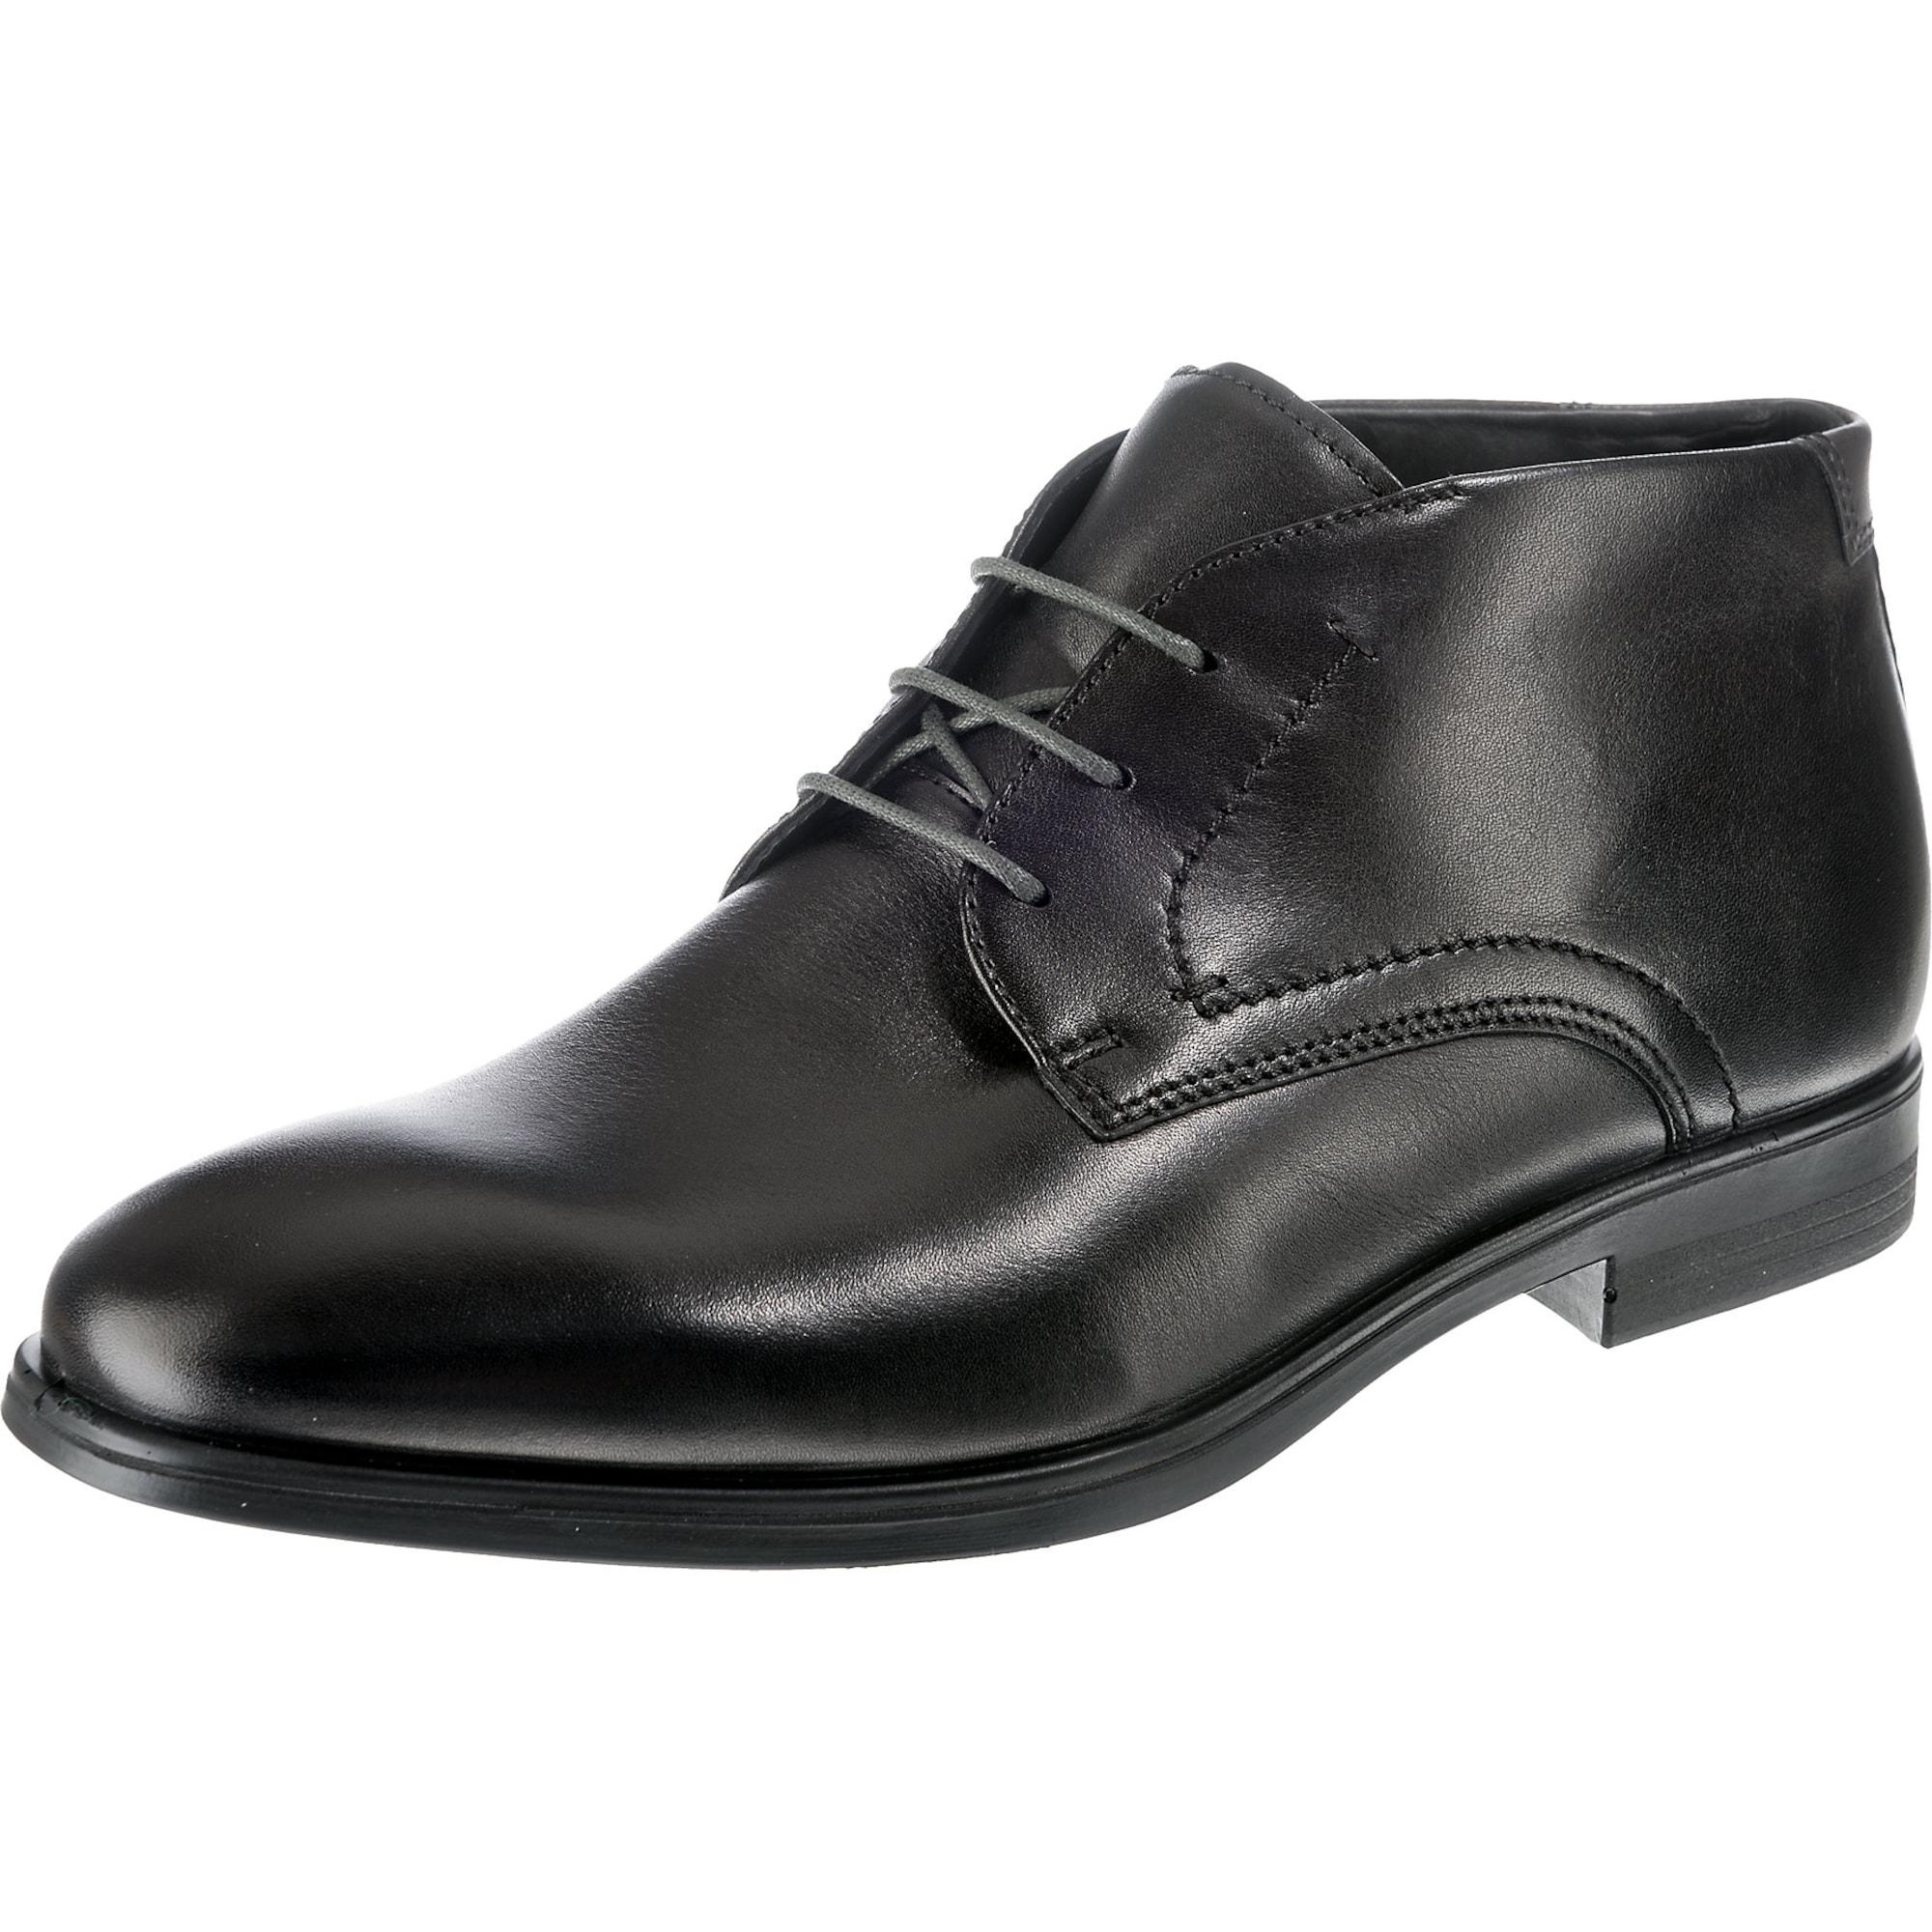 Šněrovací boty Melburne černá ECCO